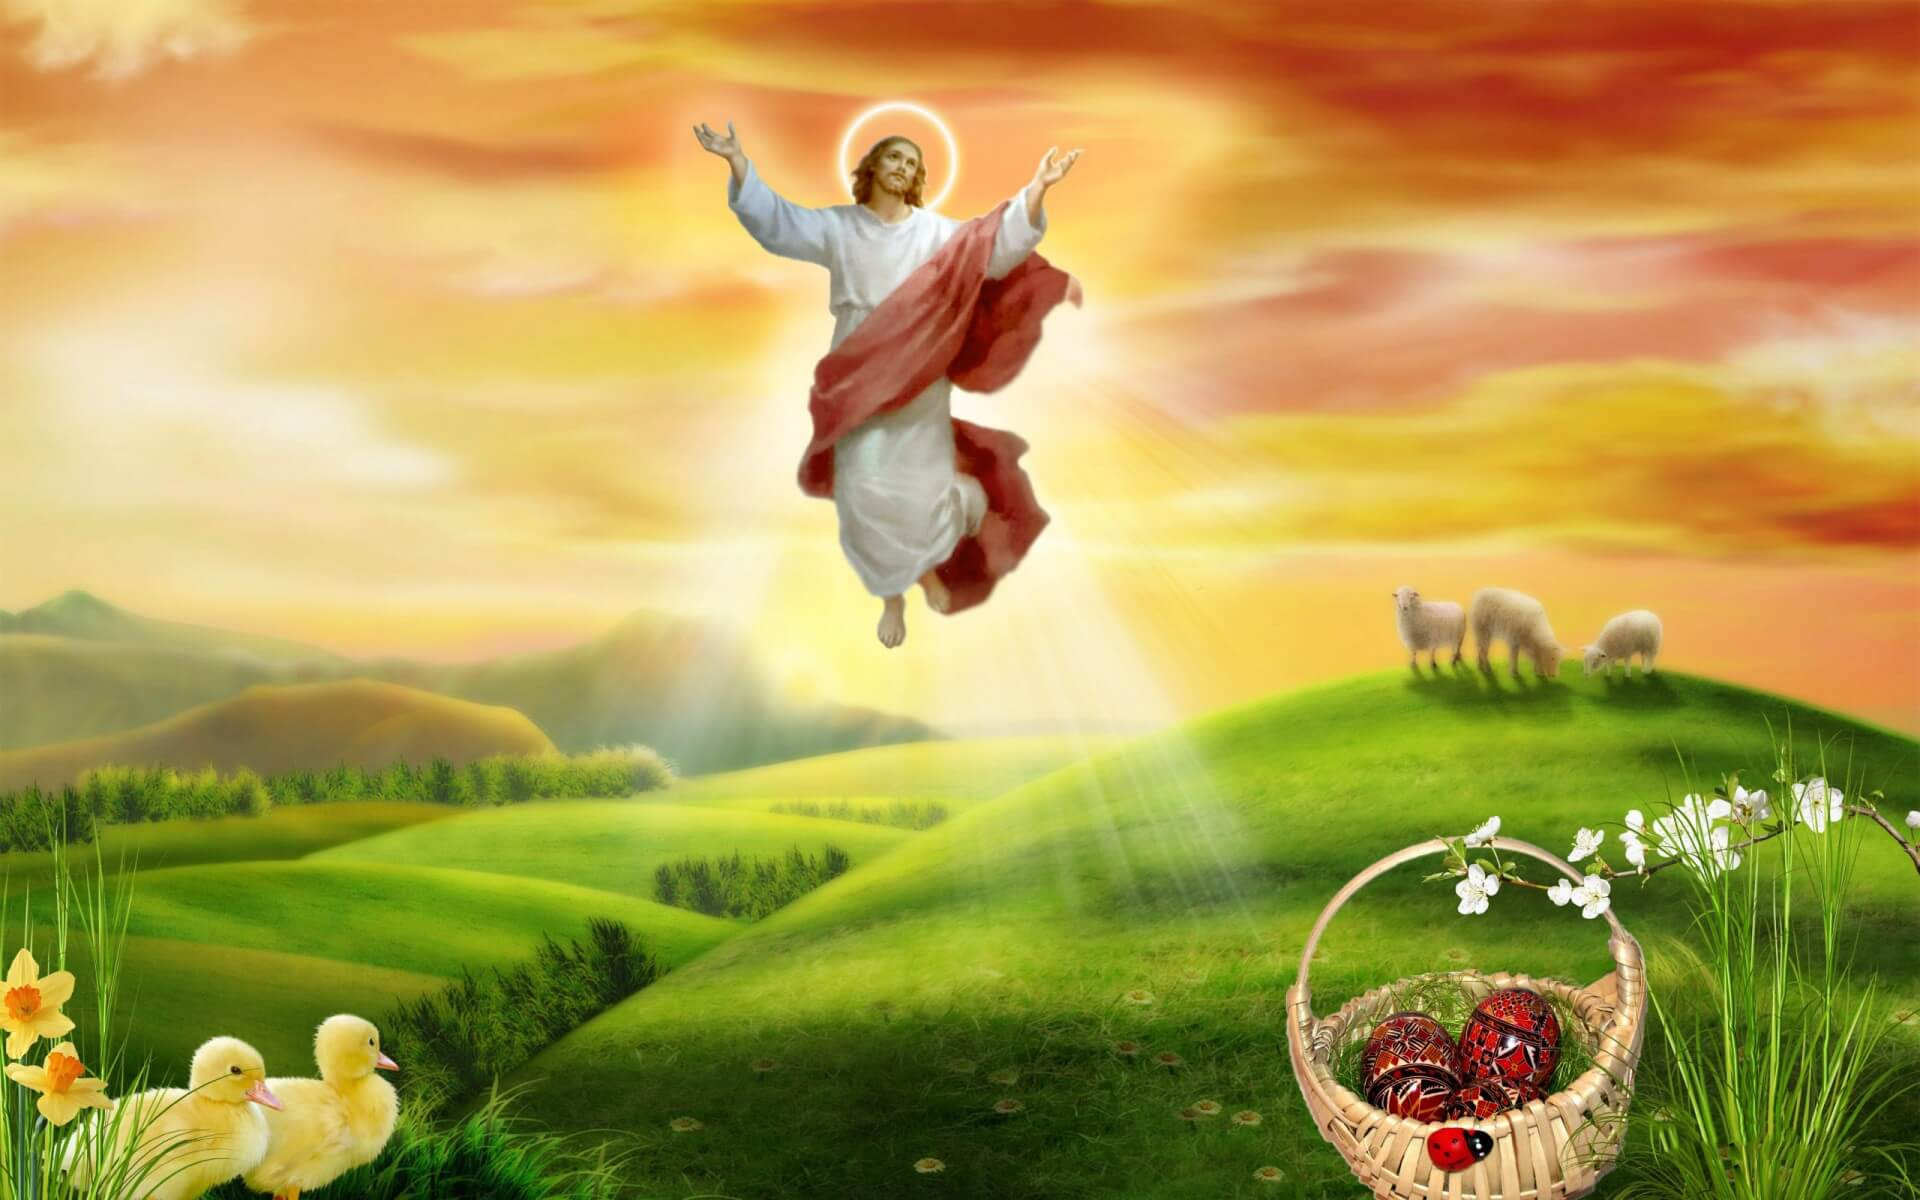 happy easter jesus resurrection art hd wallpaper background